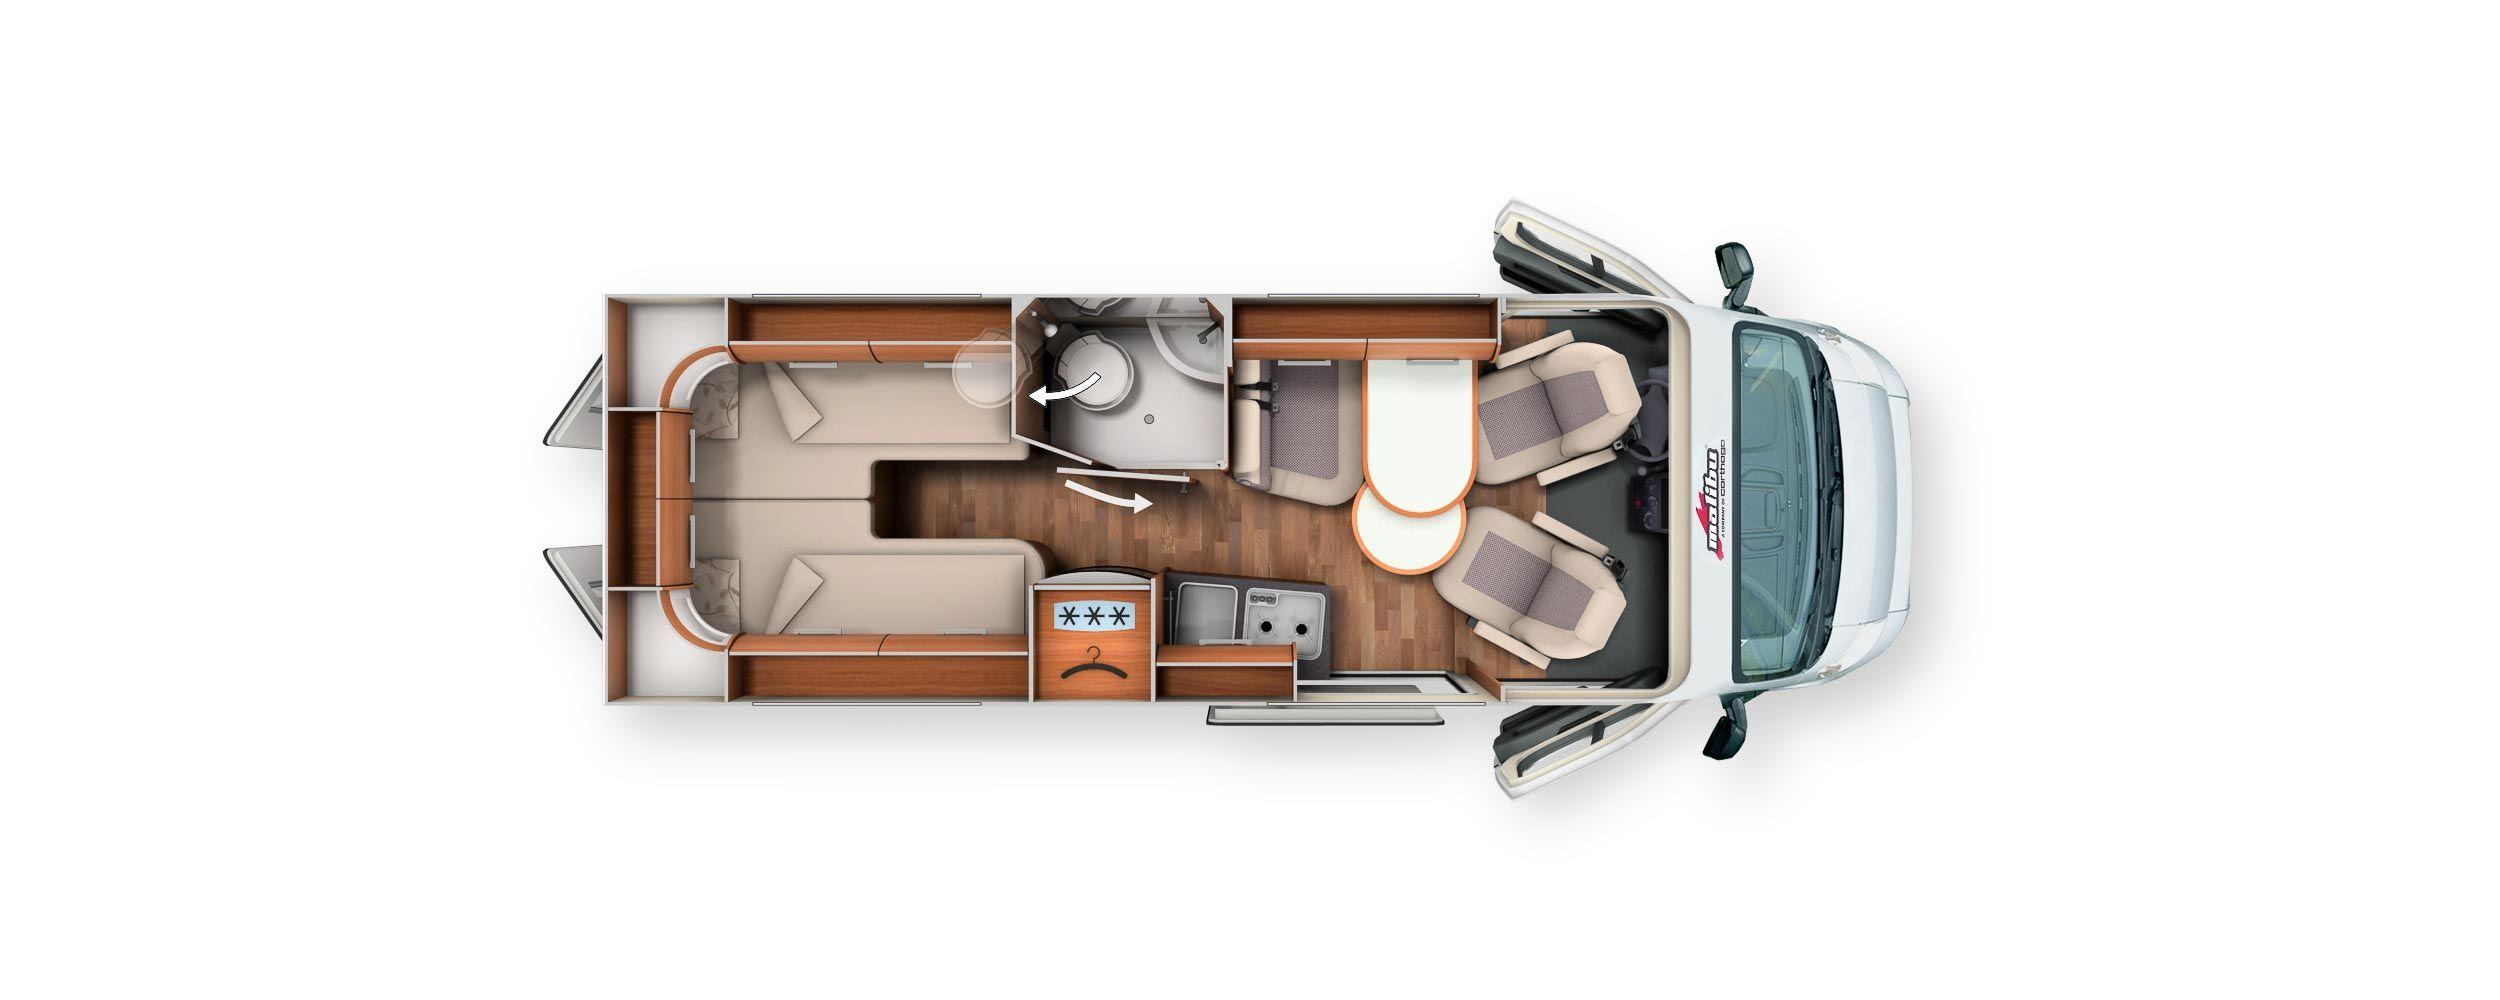 Malibu 640 Charming - Bild 1